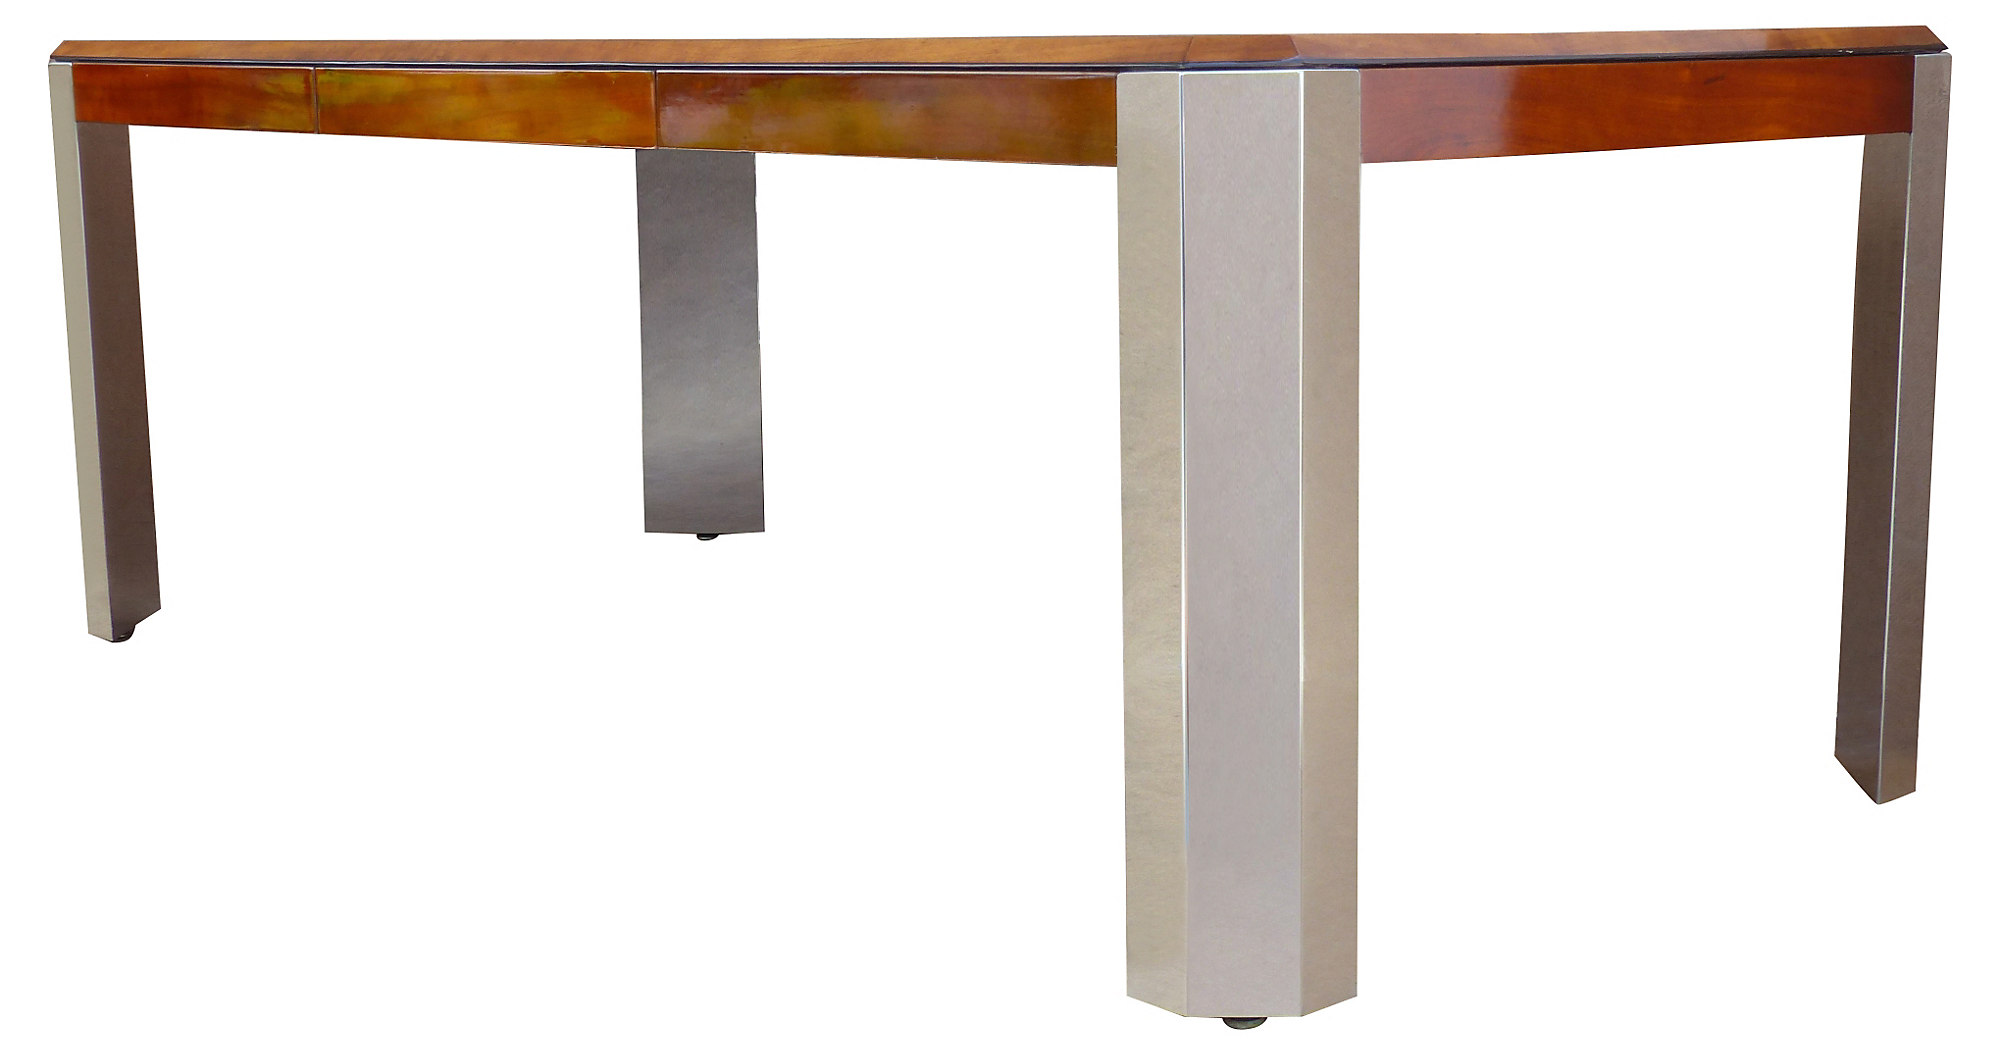 Leon Rosen Pace Collection Desk